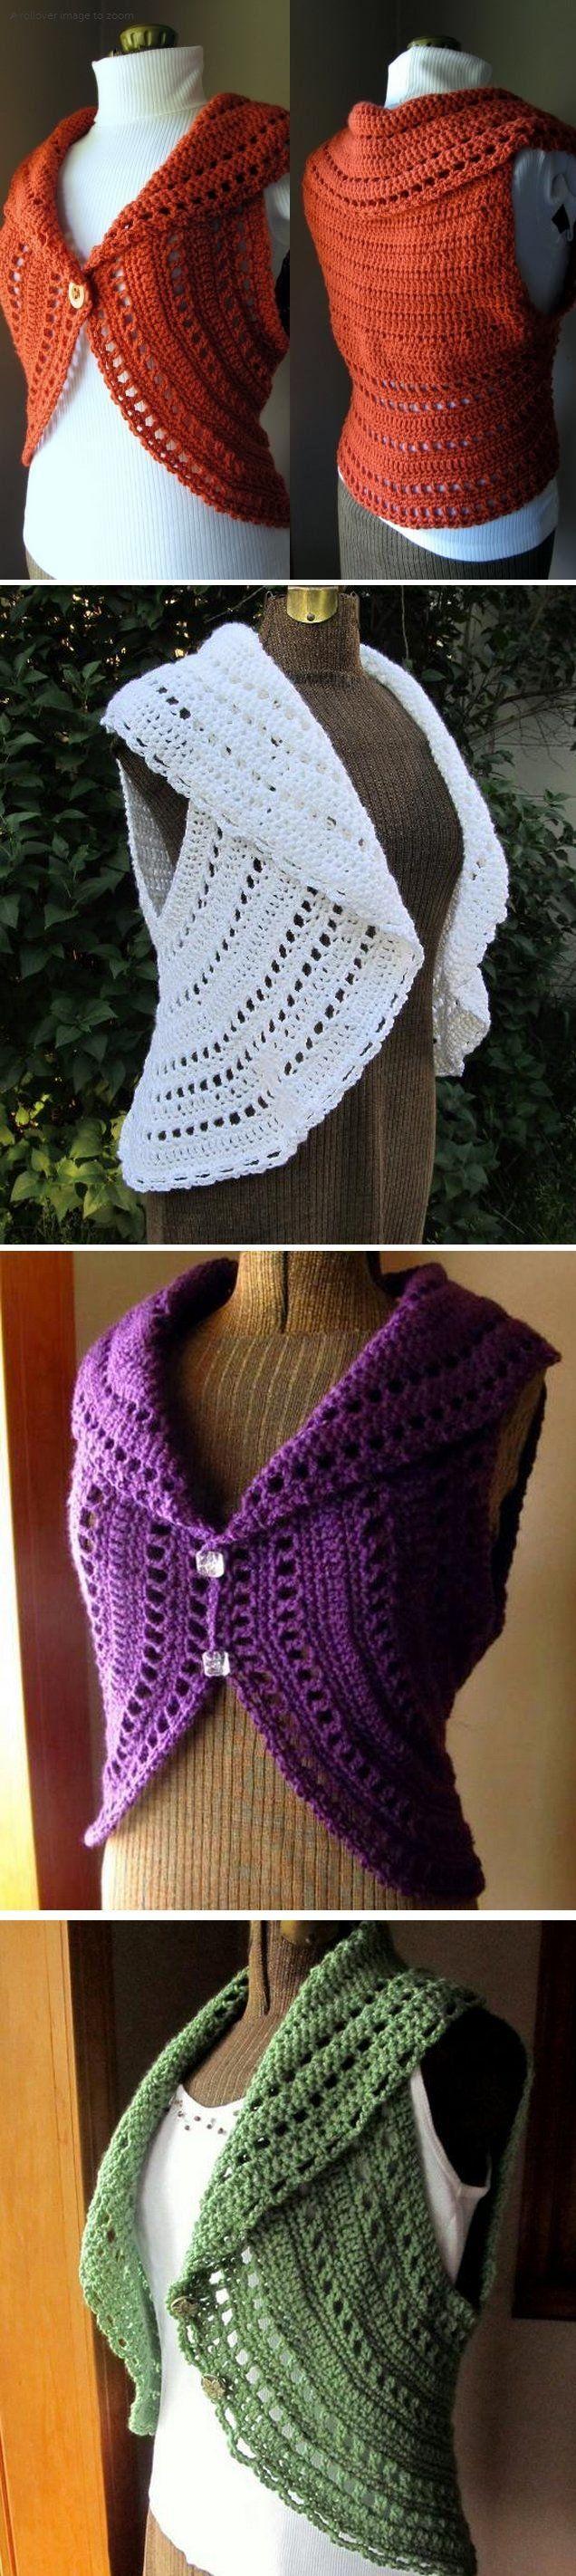 Emmy Makes: Crochet Ladies | Crochet and needlework~ | Pinterest ...